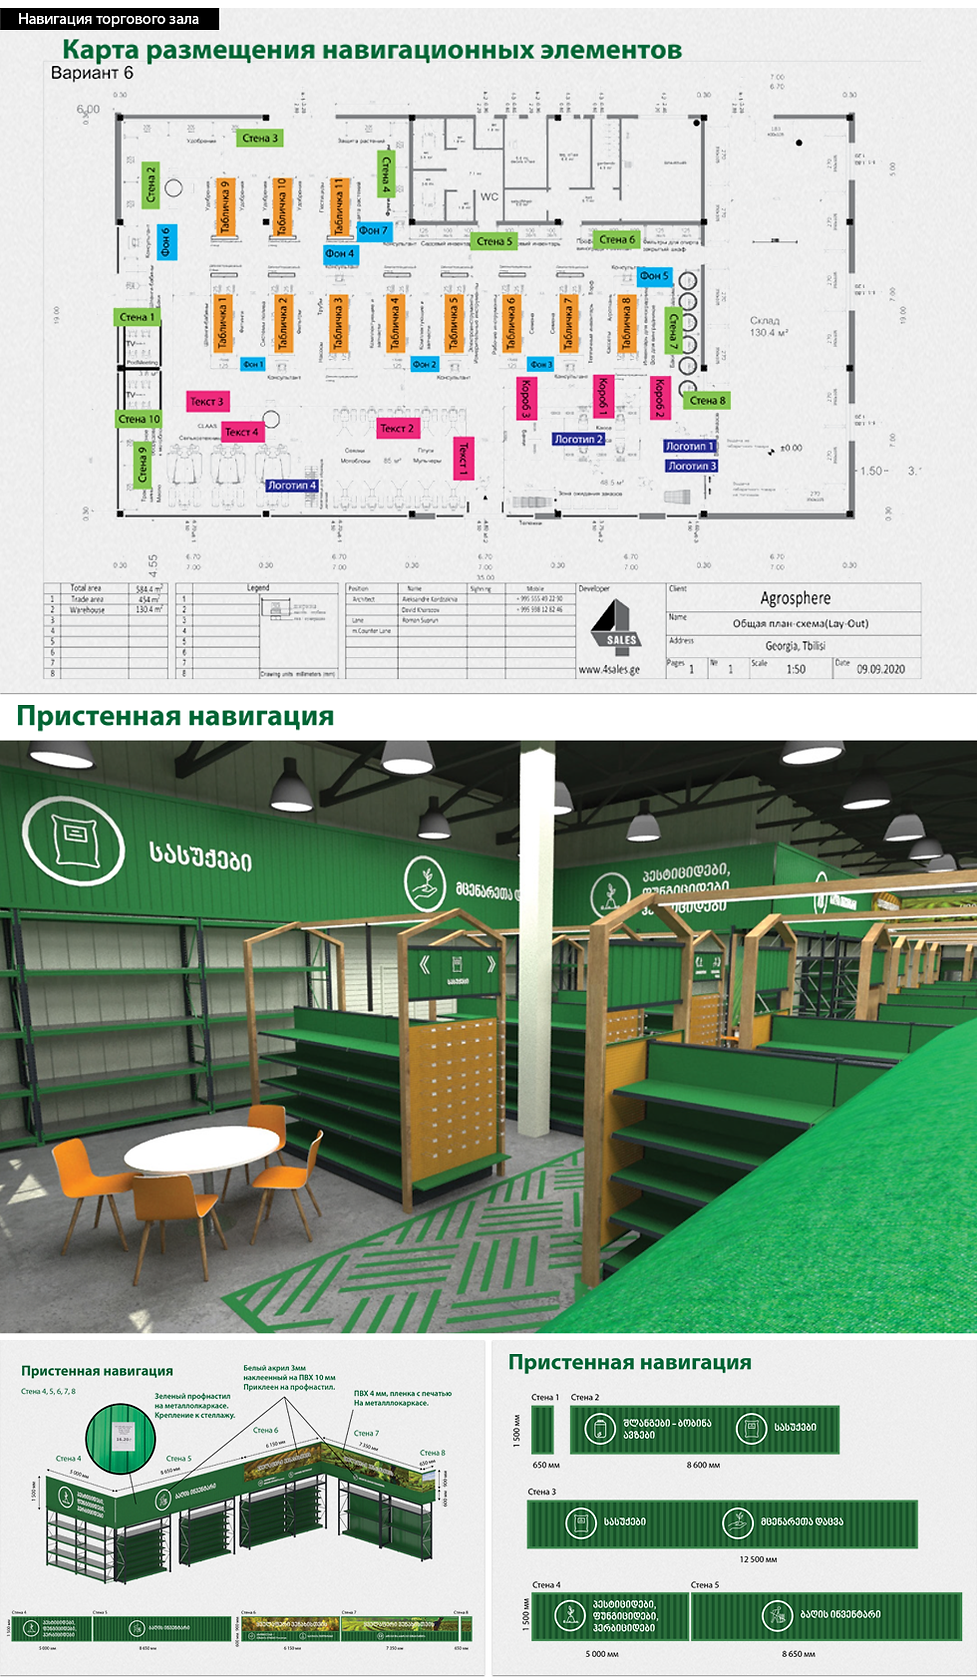 magaziis dizaini da proeqtireba 09.png